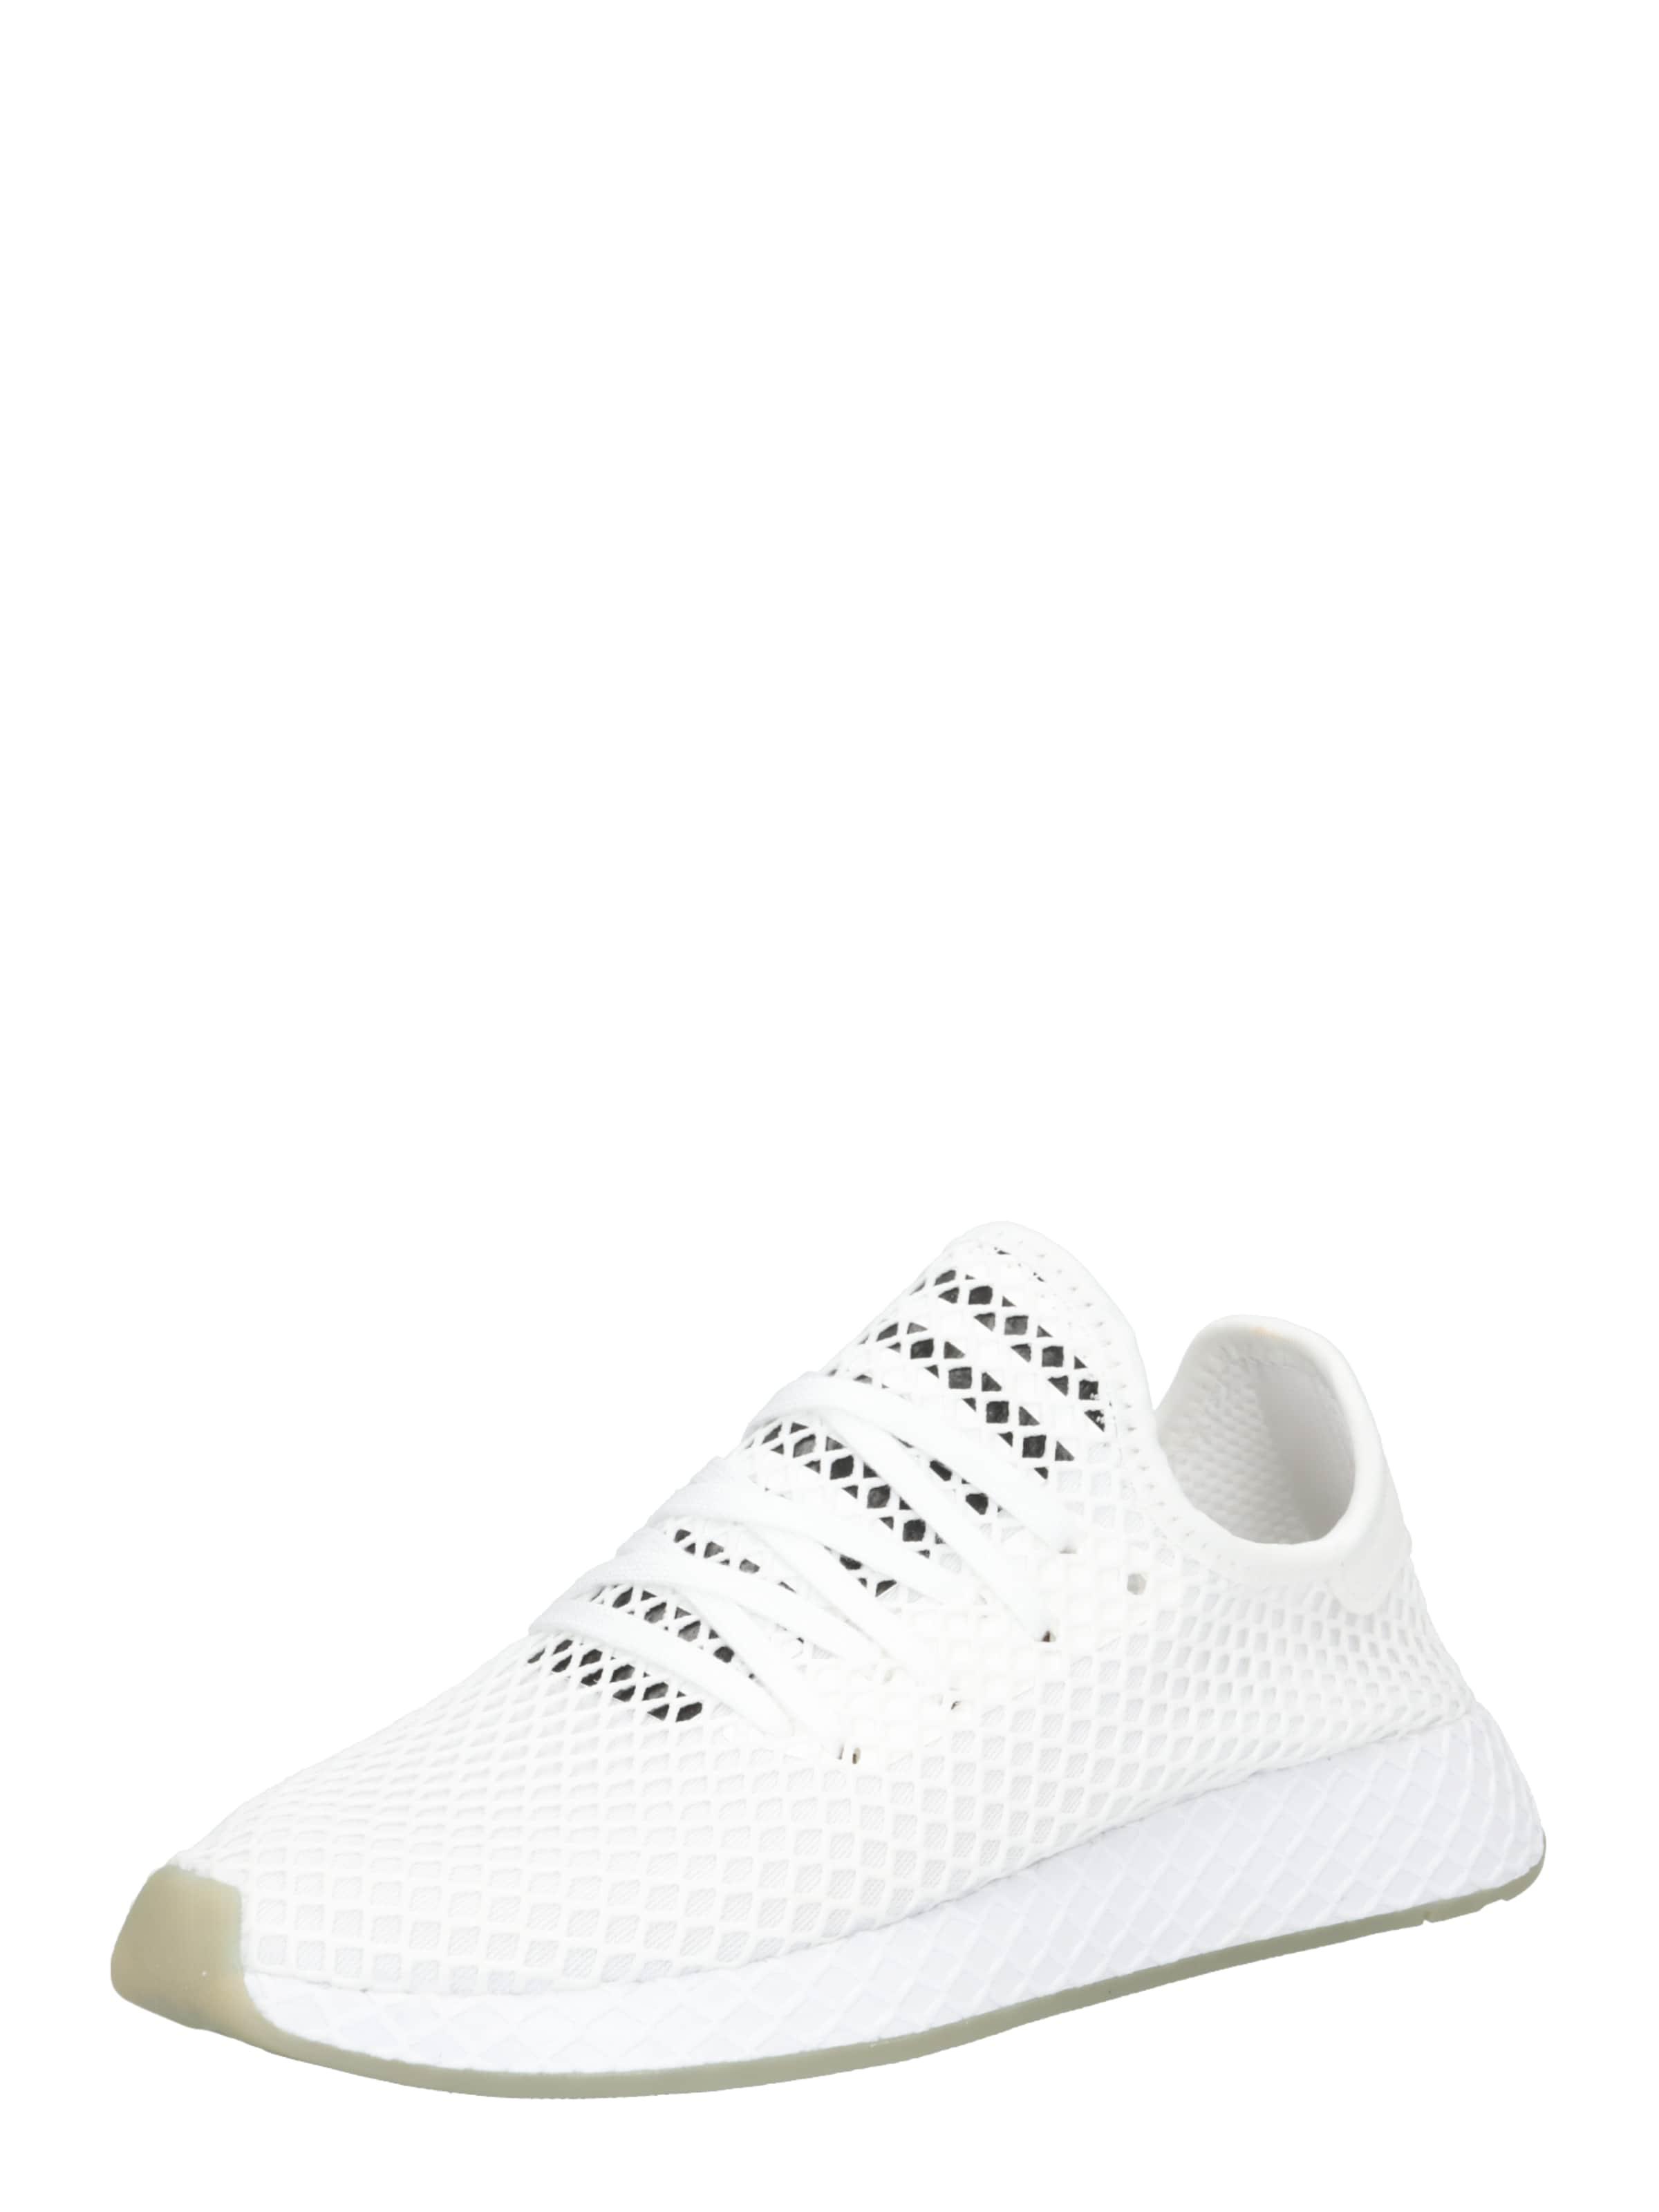 'deerupt In Weiß Runner' Adidas Originals Sneaker Yfvyb76g